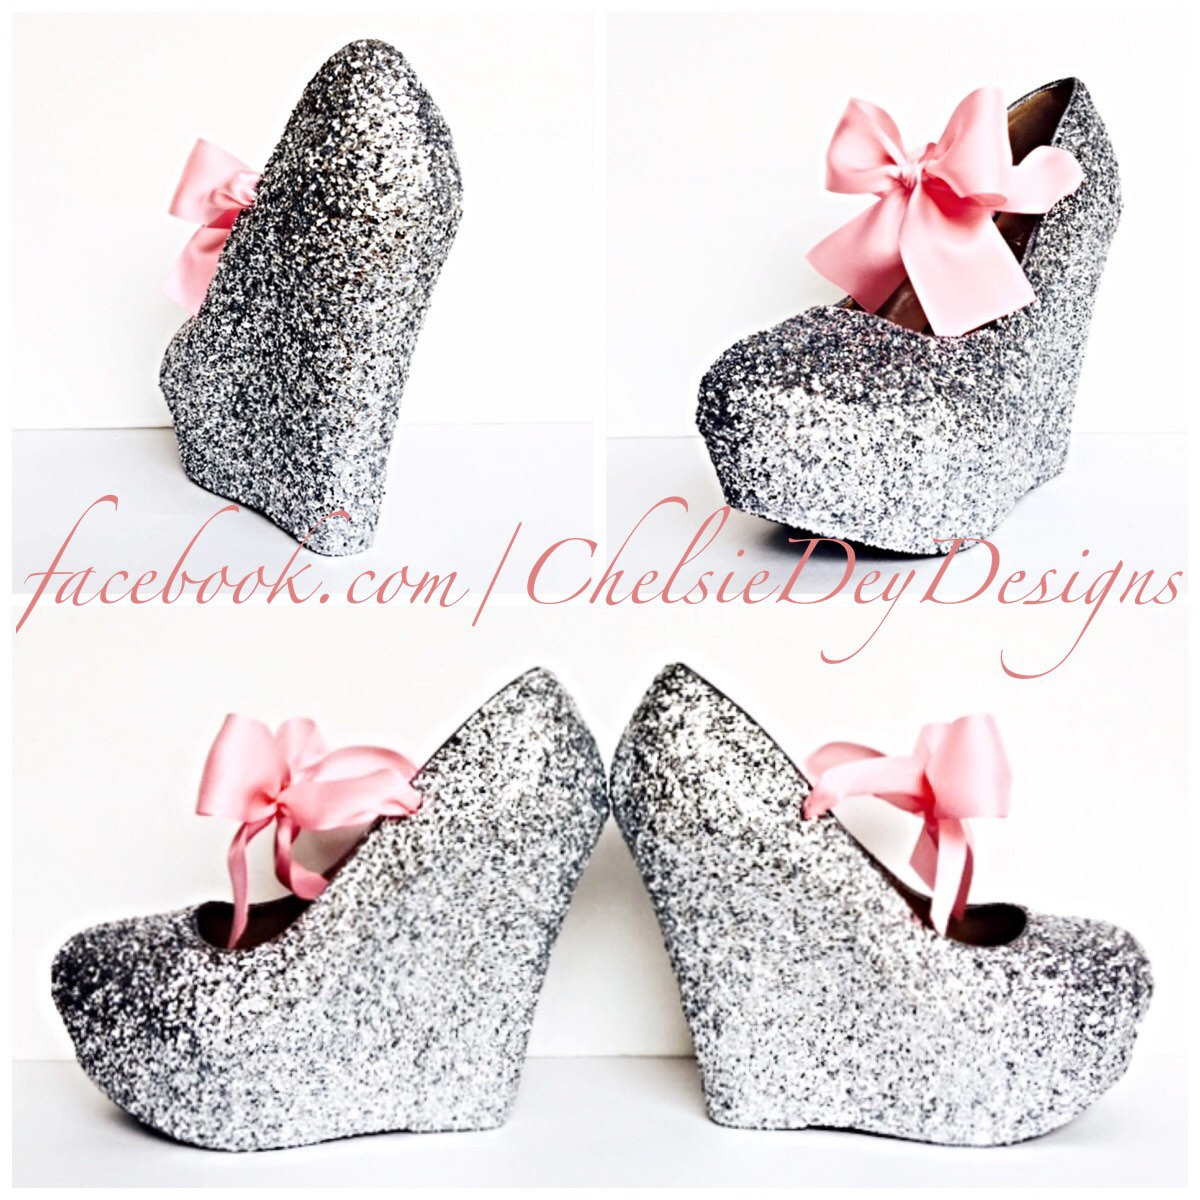 Glitter Wedge High Heels   Silver Pump Platform Shoes   Light Pink Satin  Bows   Wedding